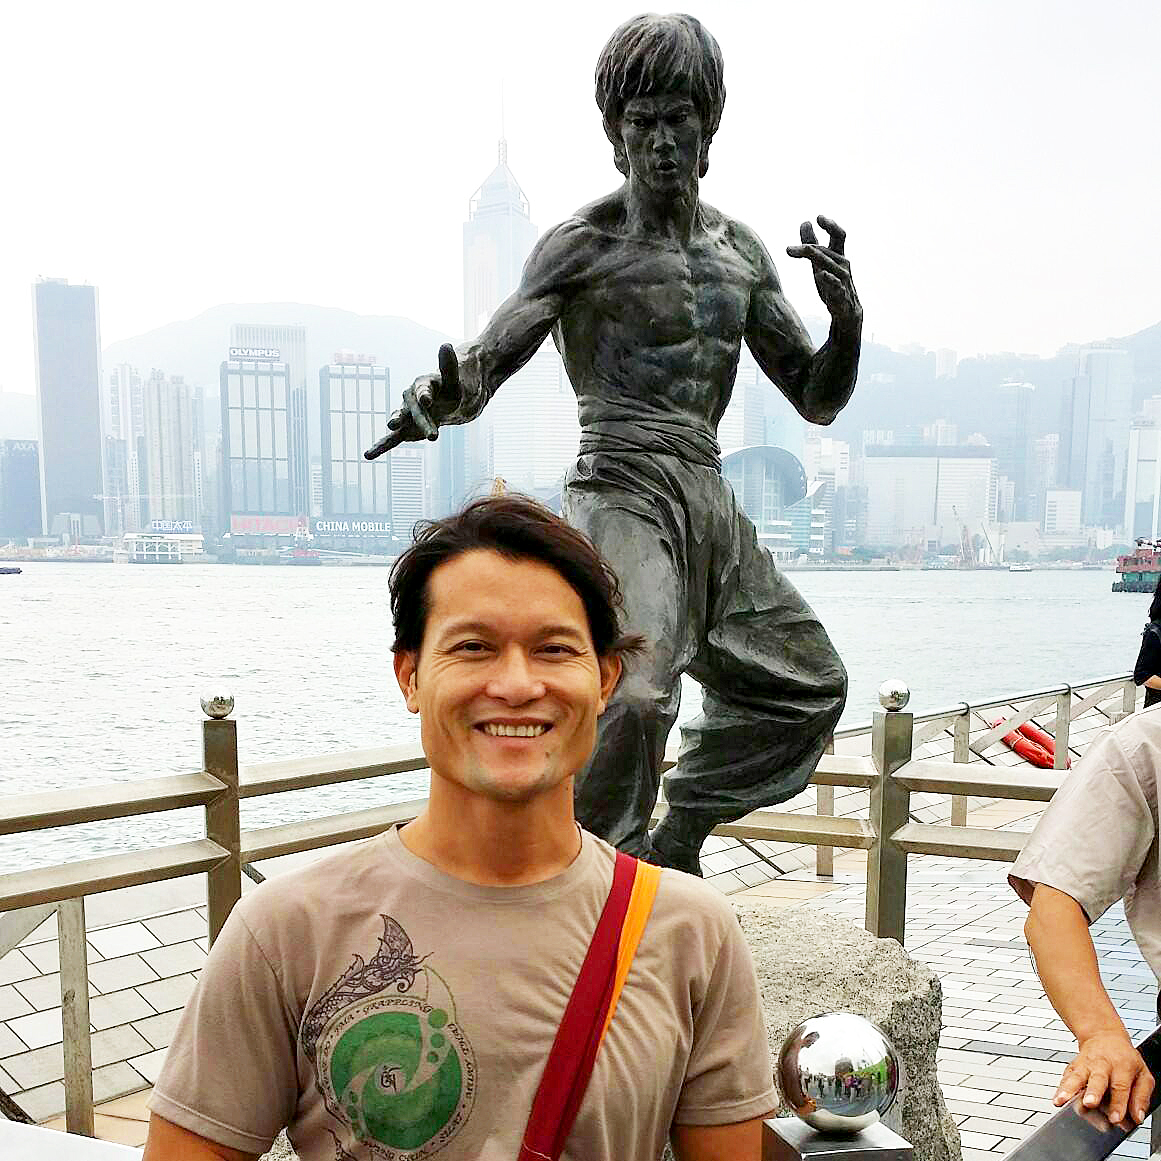 Sifu-maestro-tylus-quan-do-en-hong-kong-con-estatua-de-bruce-lee-avenida-estrellas-Tsim-sha-tsui